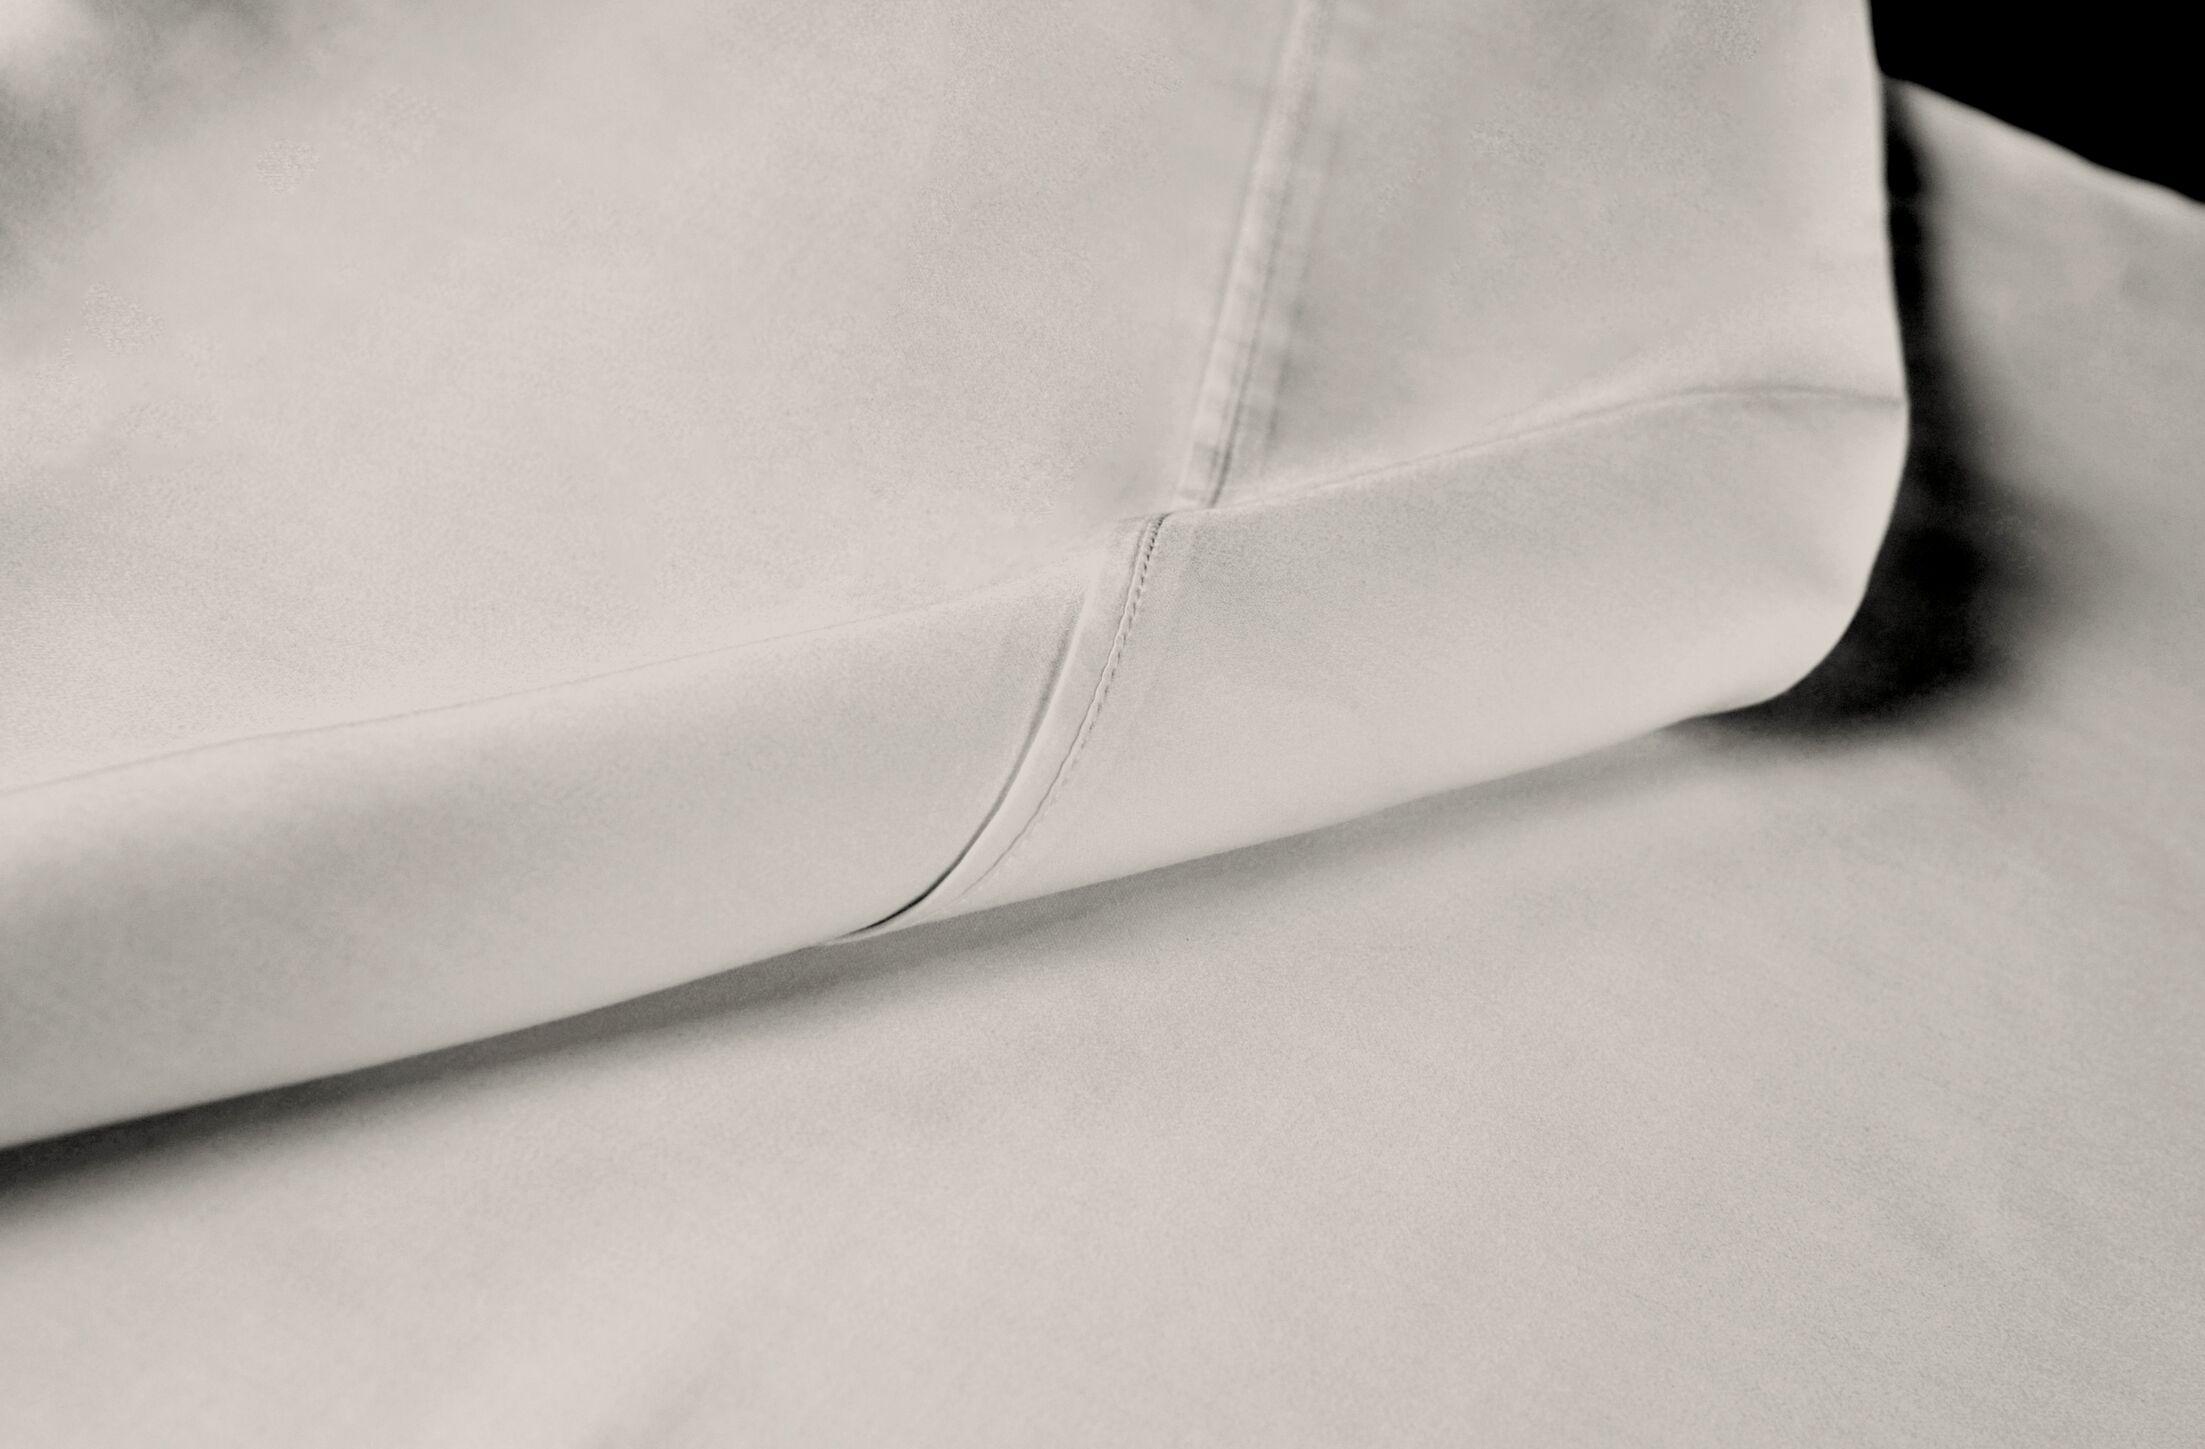 Sateen 100% Modal 300 Thread Count Sheet Set Size: King, Color: Cream